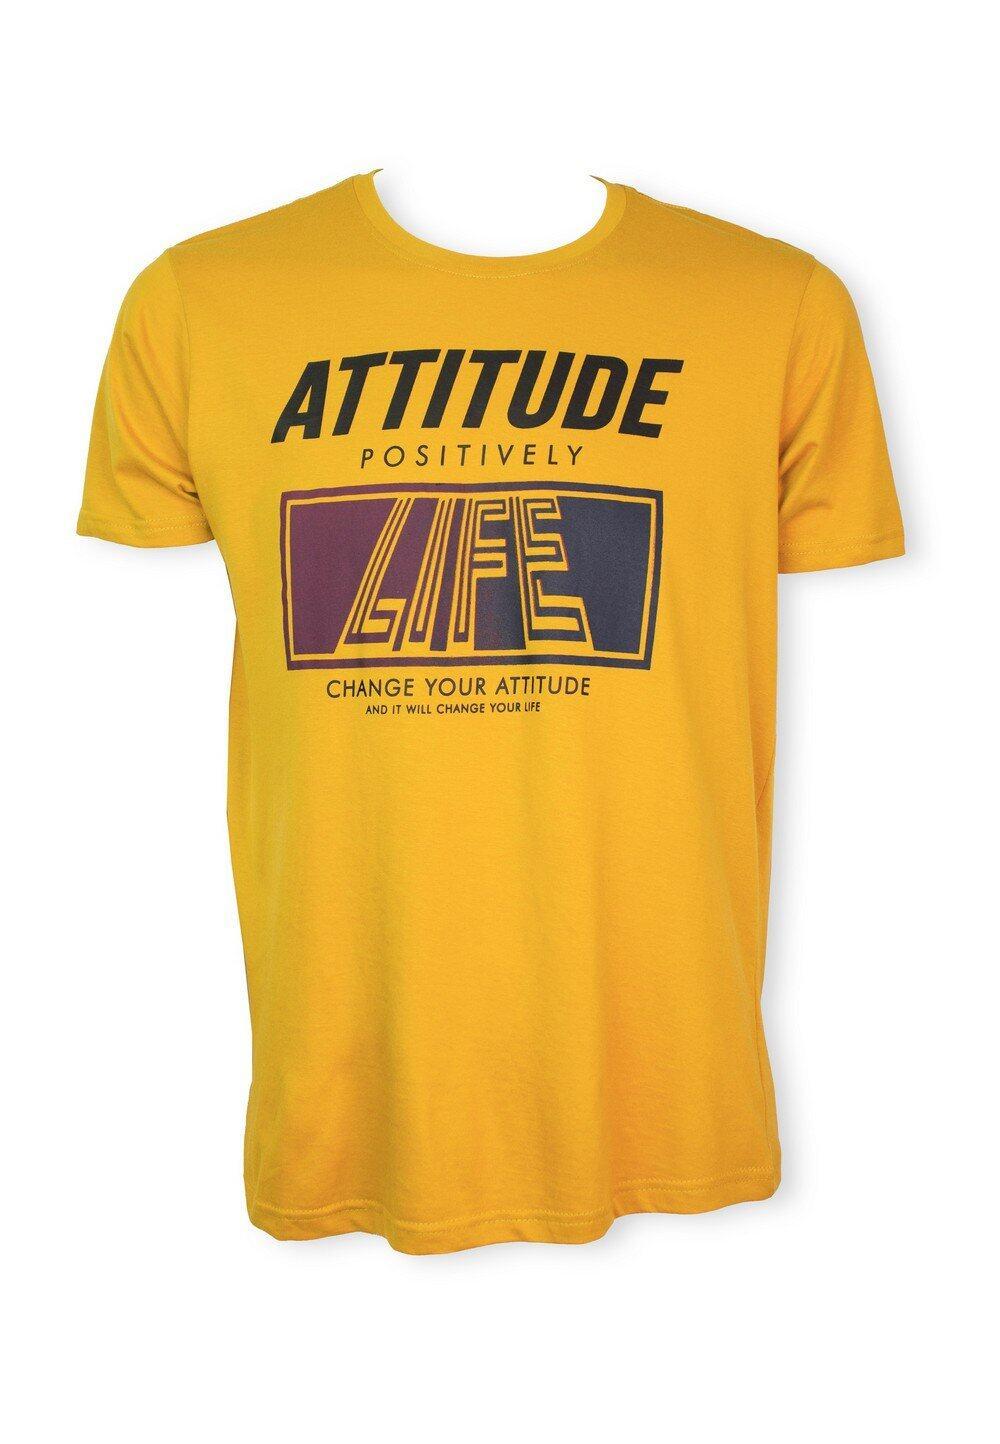 Positive Attitude T-shirt 966